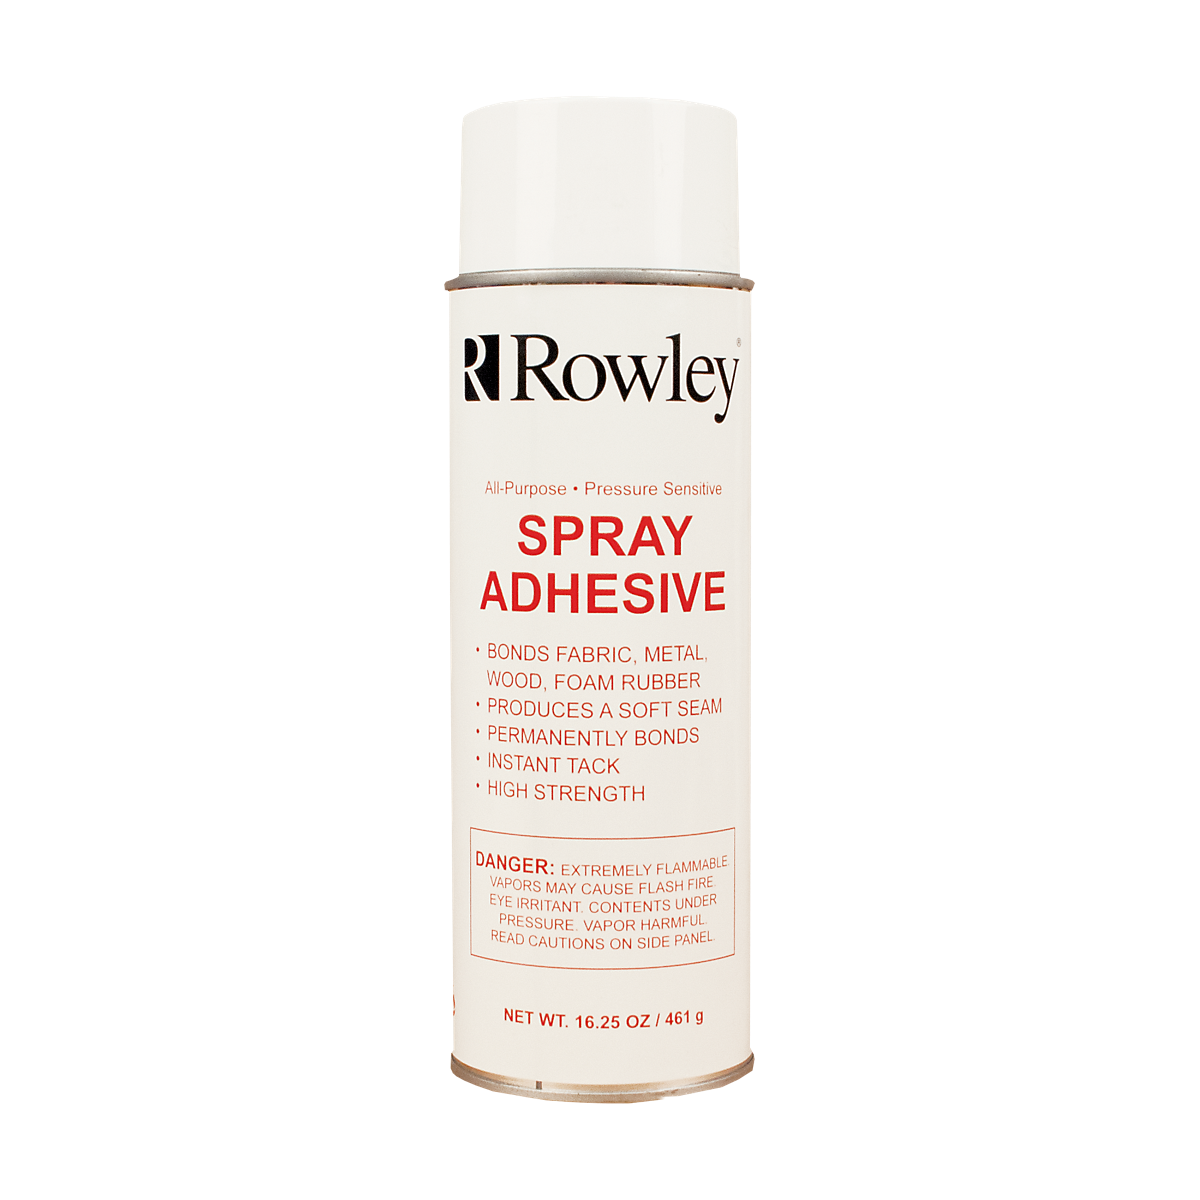 Rowley Spray Adhesive